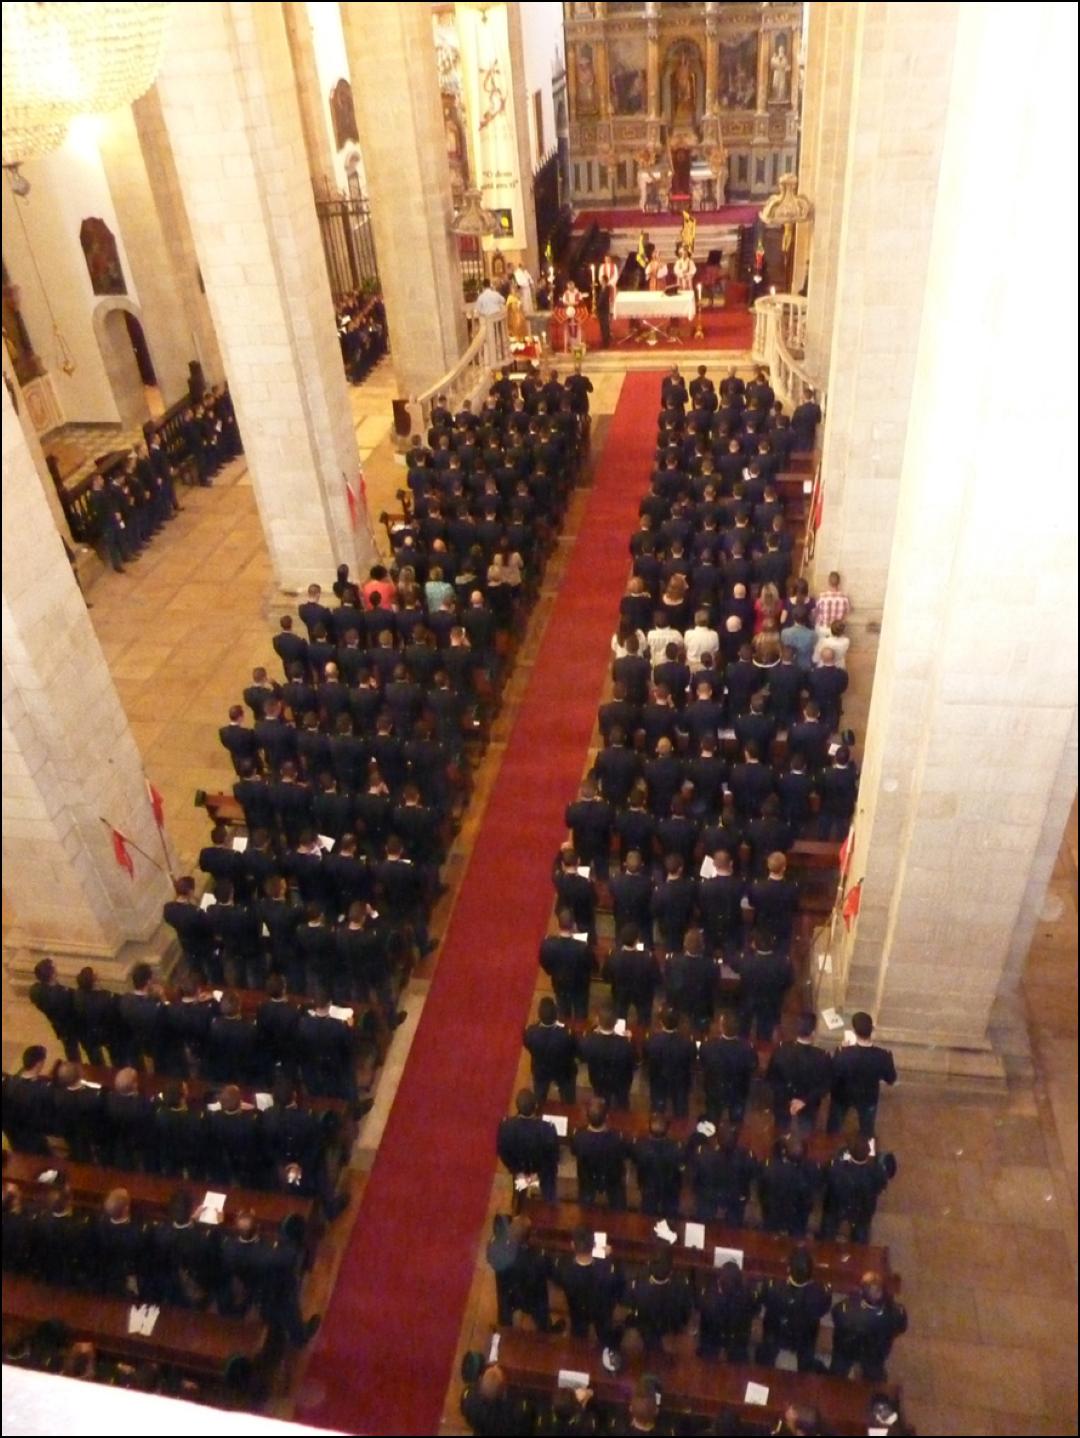 GNR na Se Catedral de Portalegre_Missa de Acao de Gracas do 35 Curso de Formacao